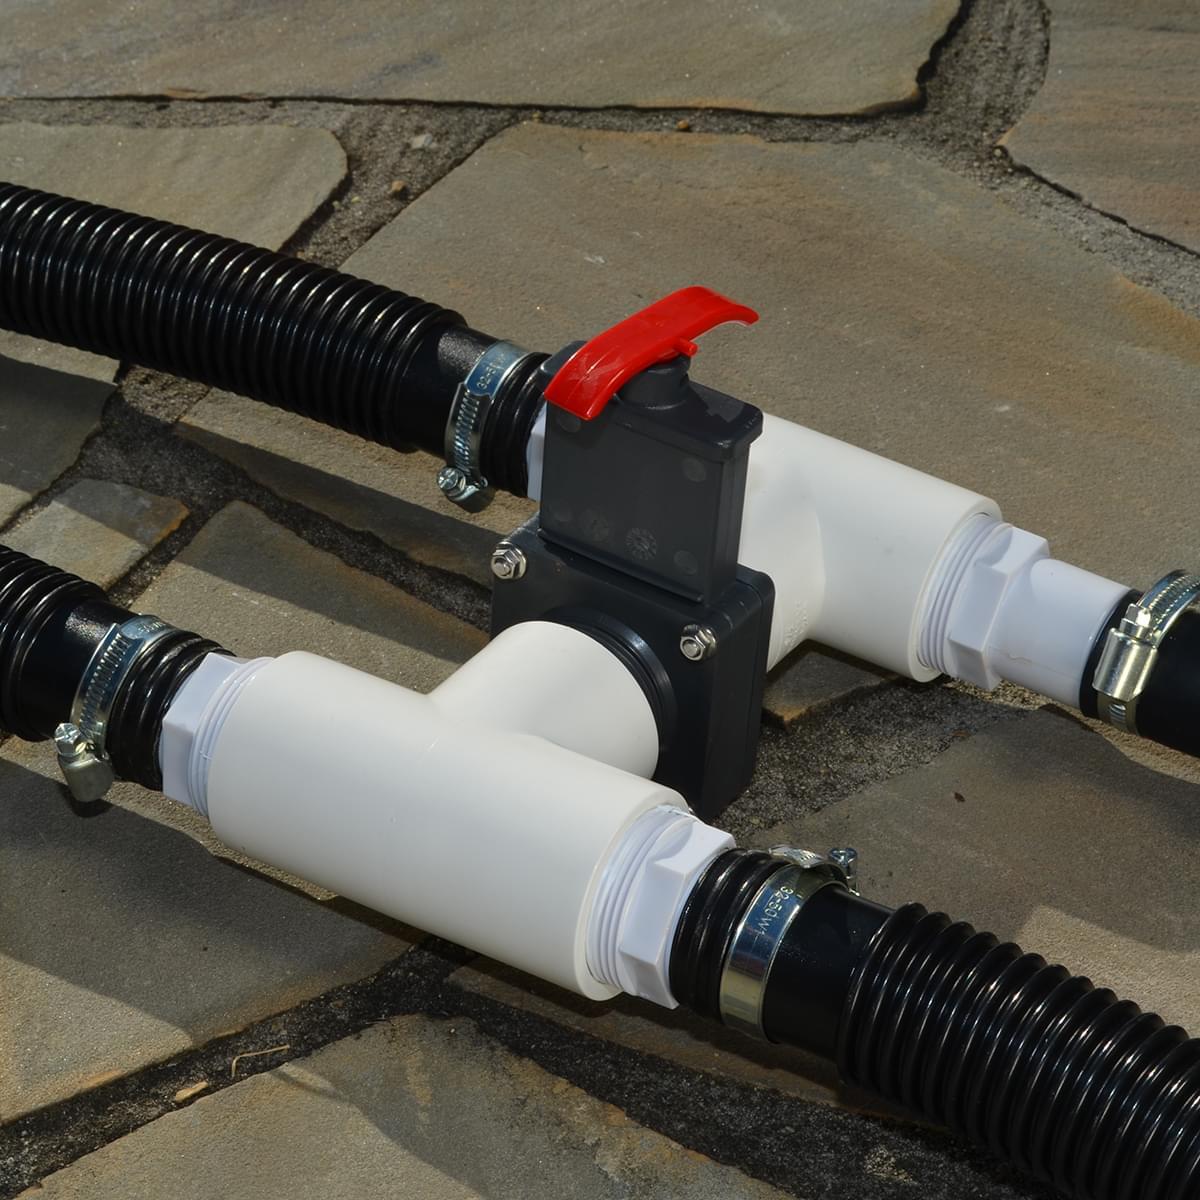 Maytronics Solara Bypass Kit Pool Supplies Canada